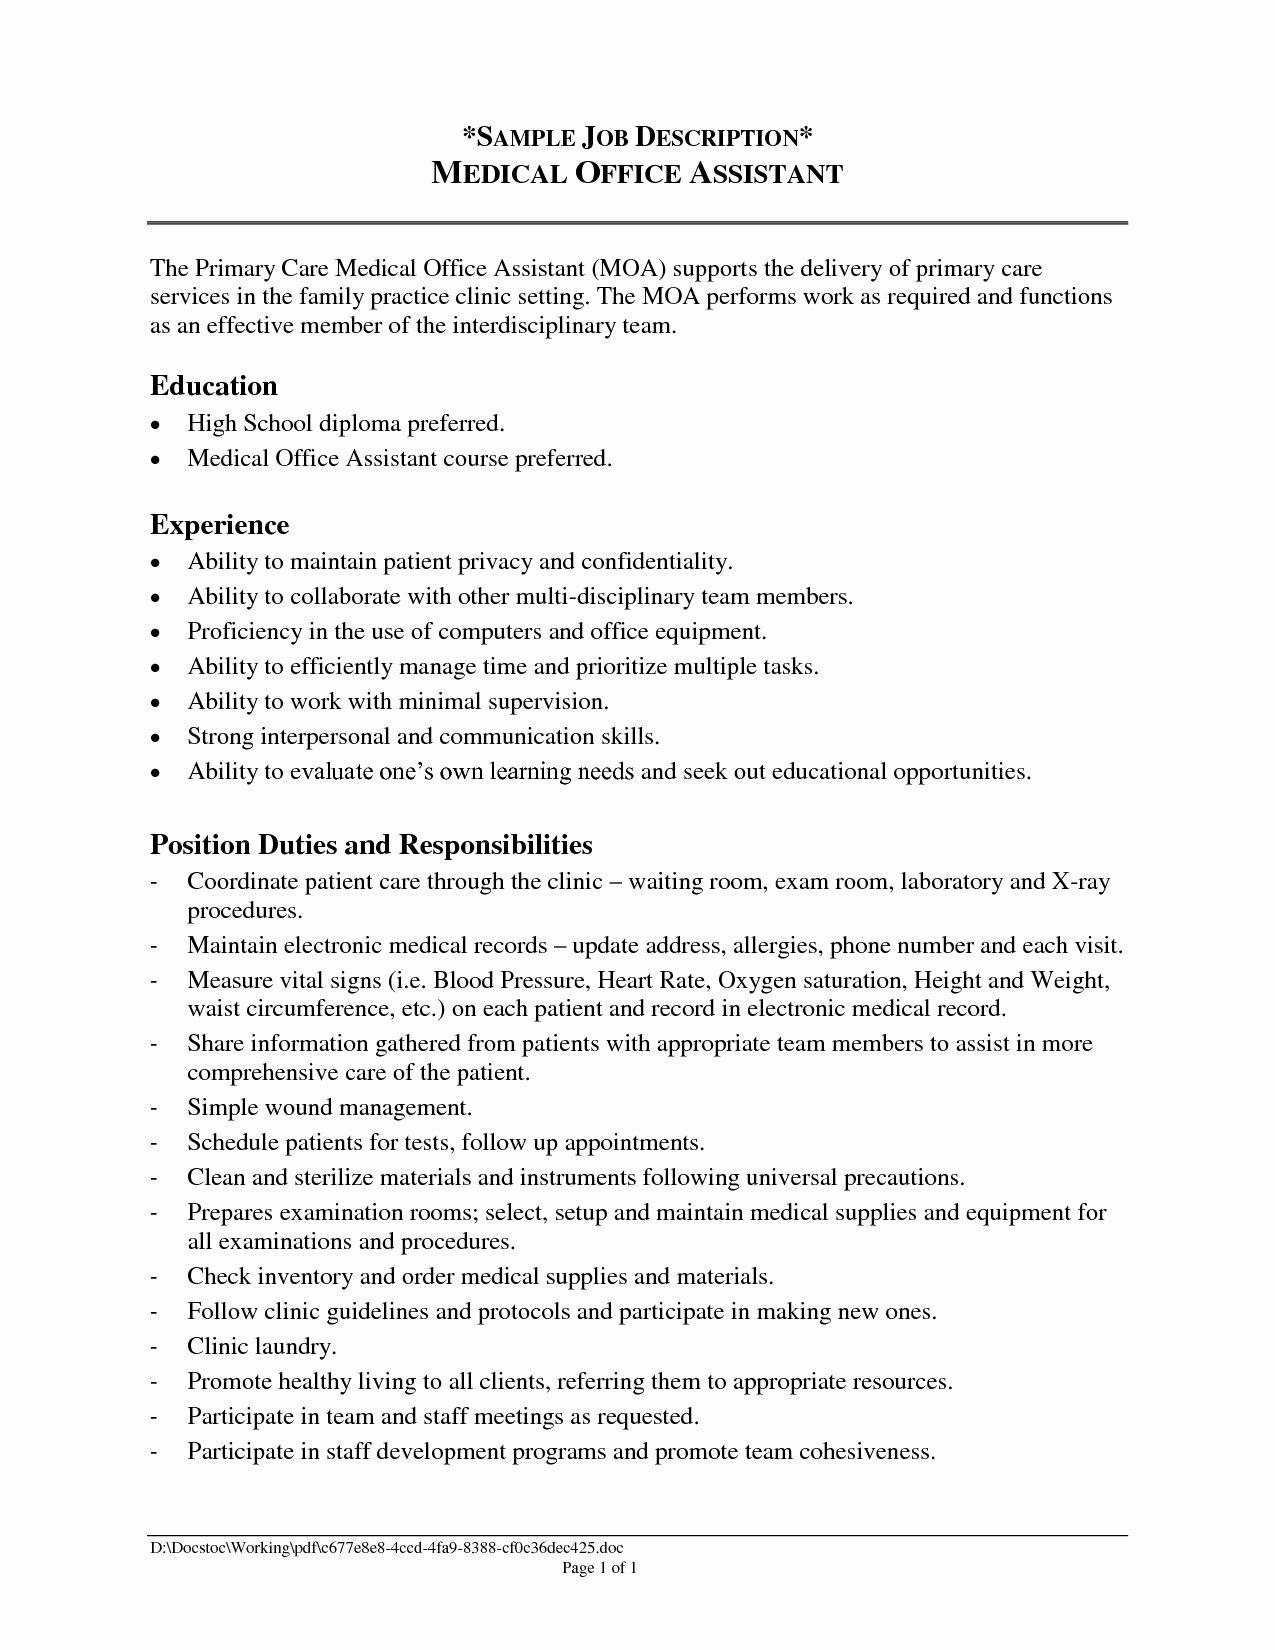 23 Office assistant Job Description Resume in 2020